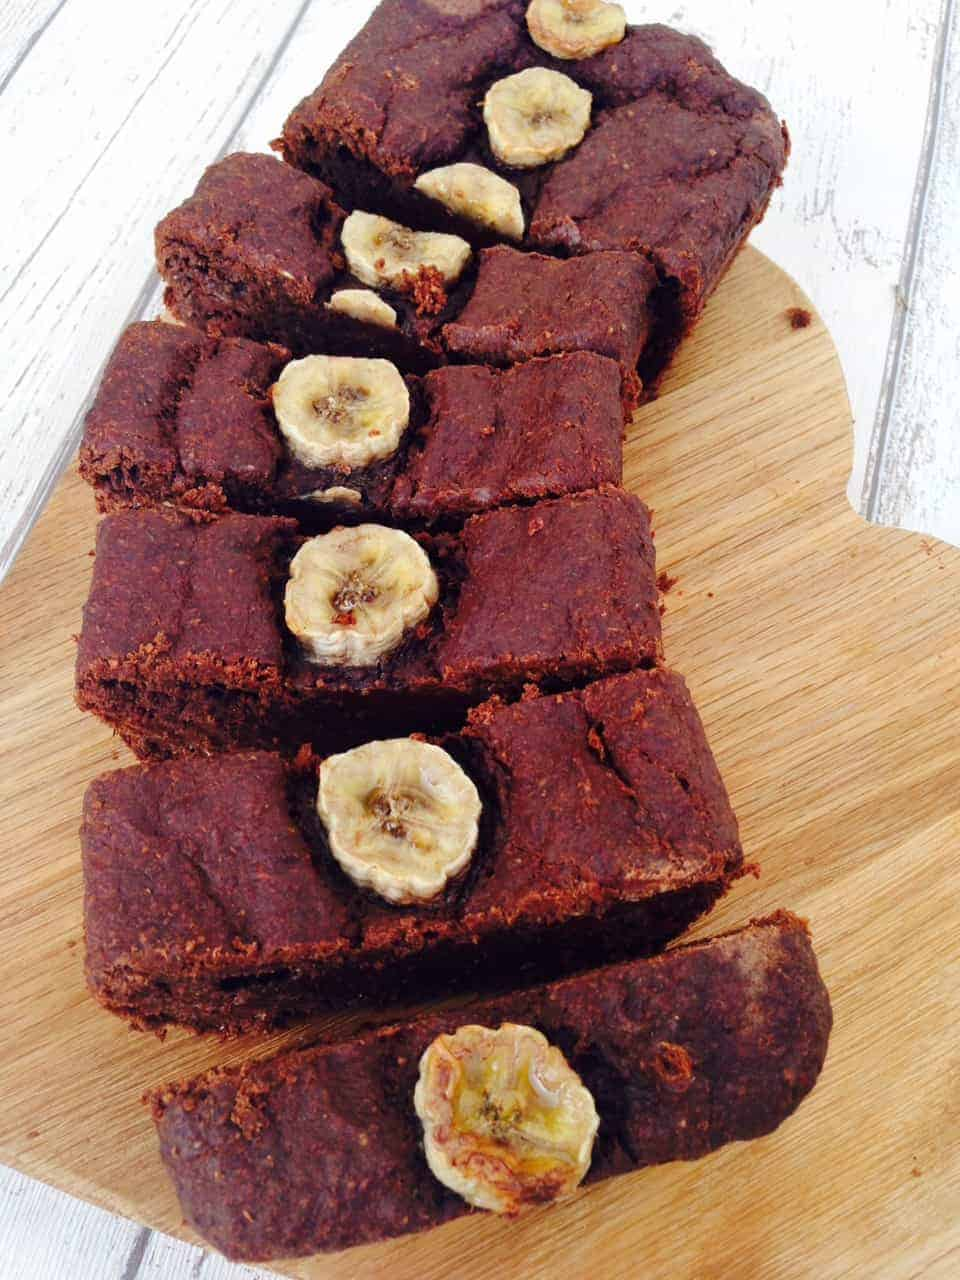 What Are Banana Plant Pups How To Separate Banana Tree: Chocolate Banana Bread Recipe